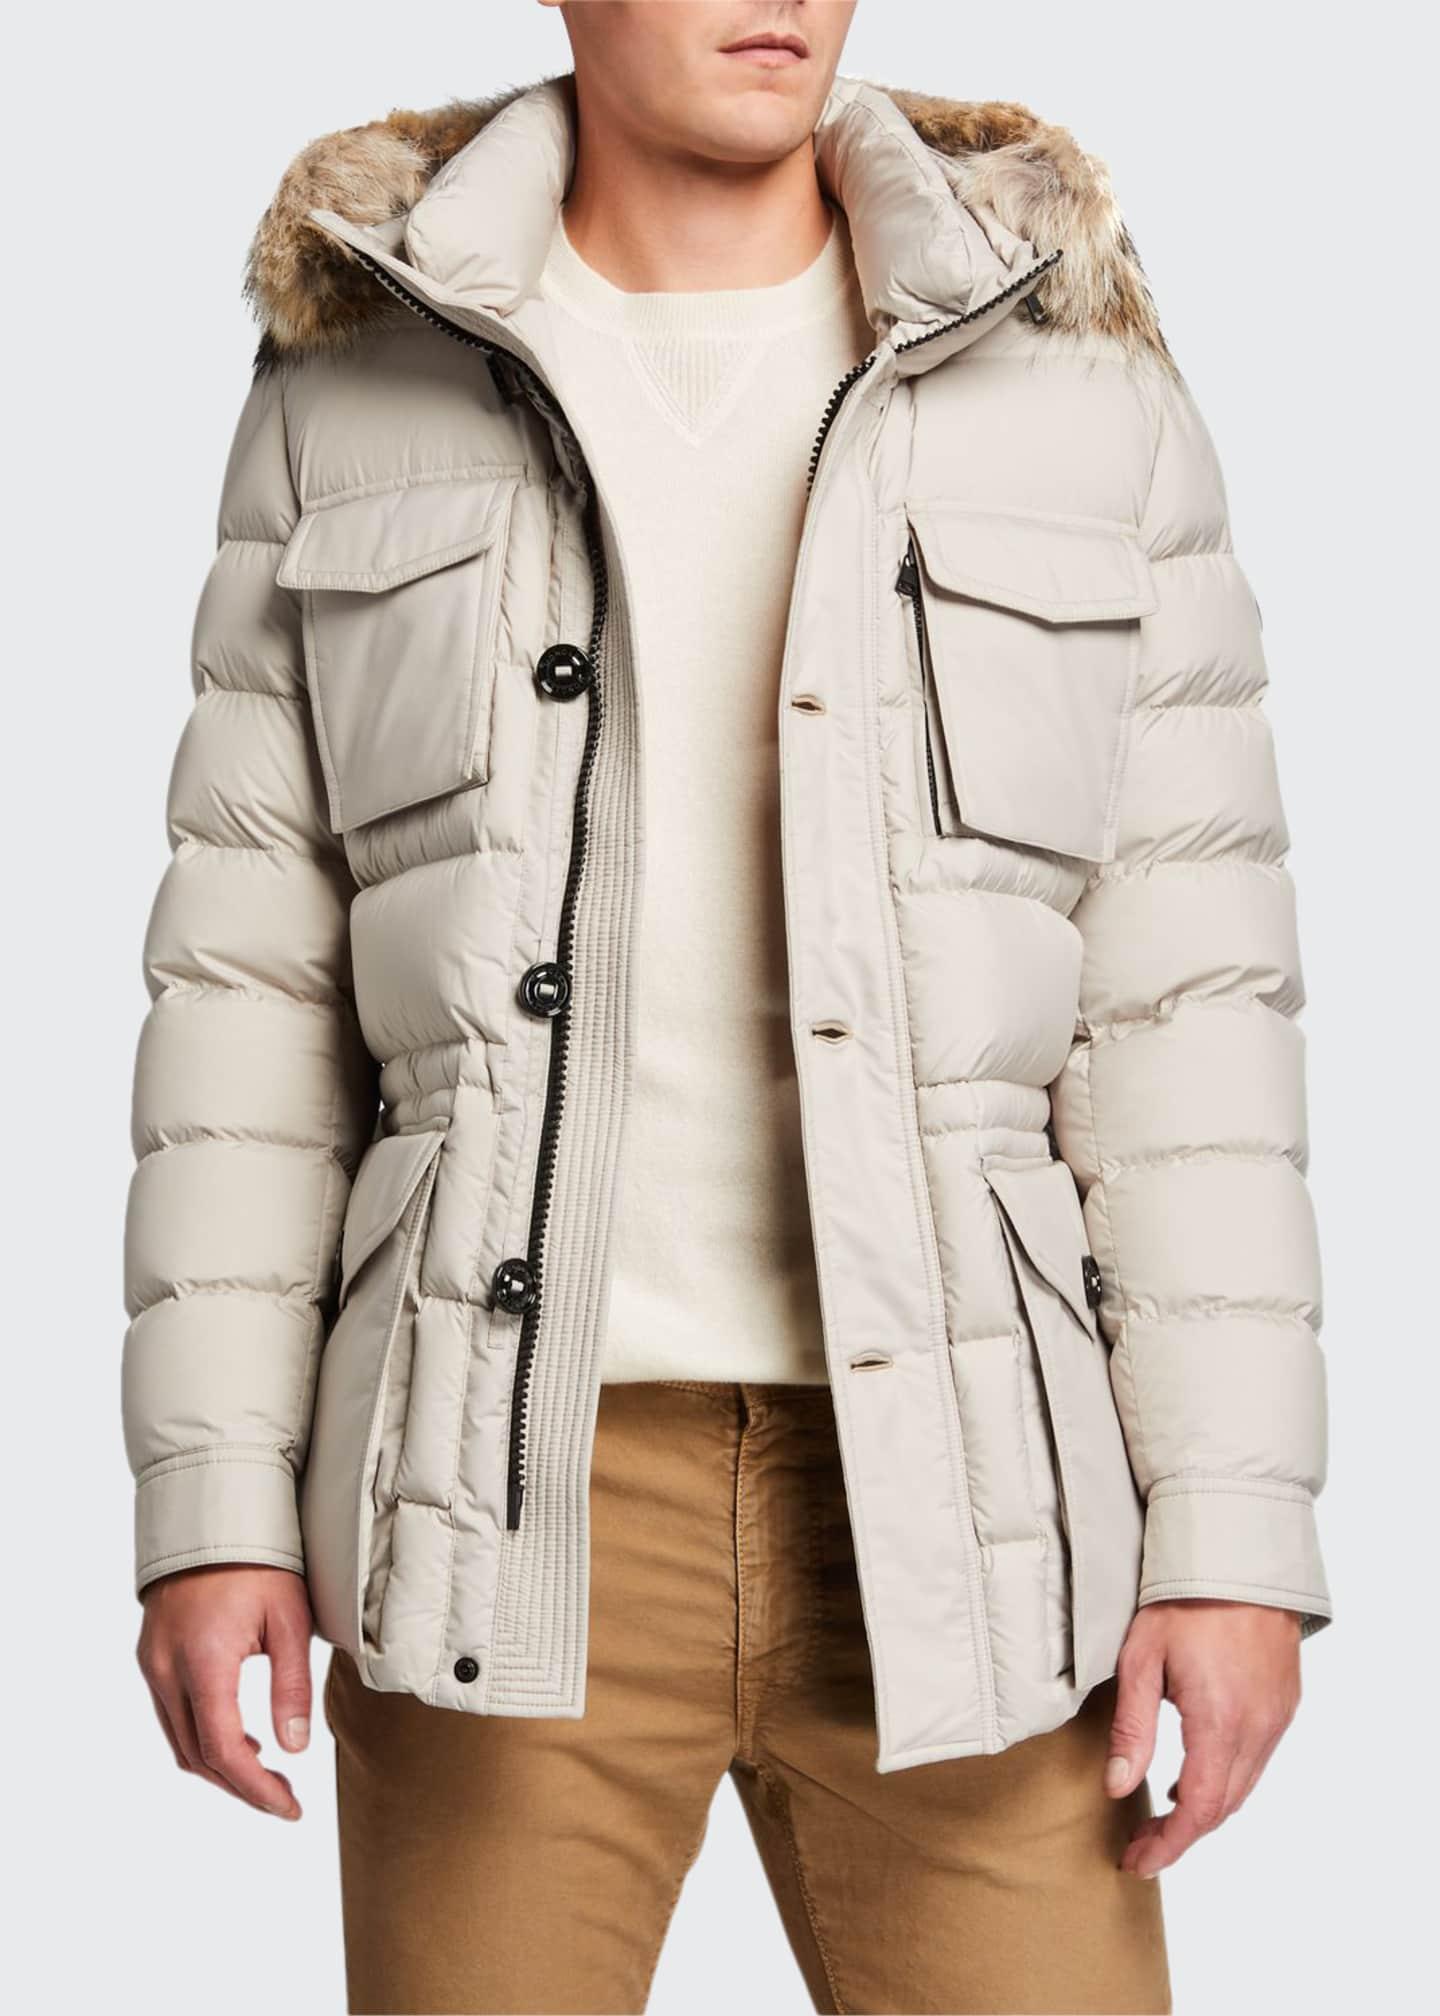 Moncler Men's Augert Puffer Coat w/ Fur Trim